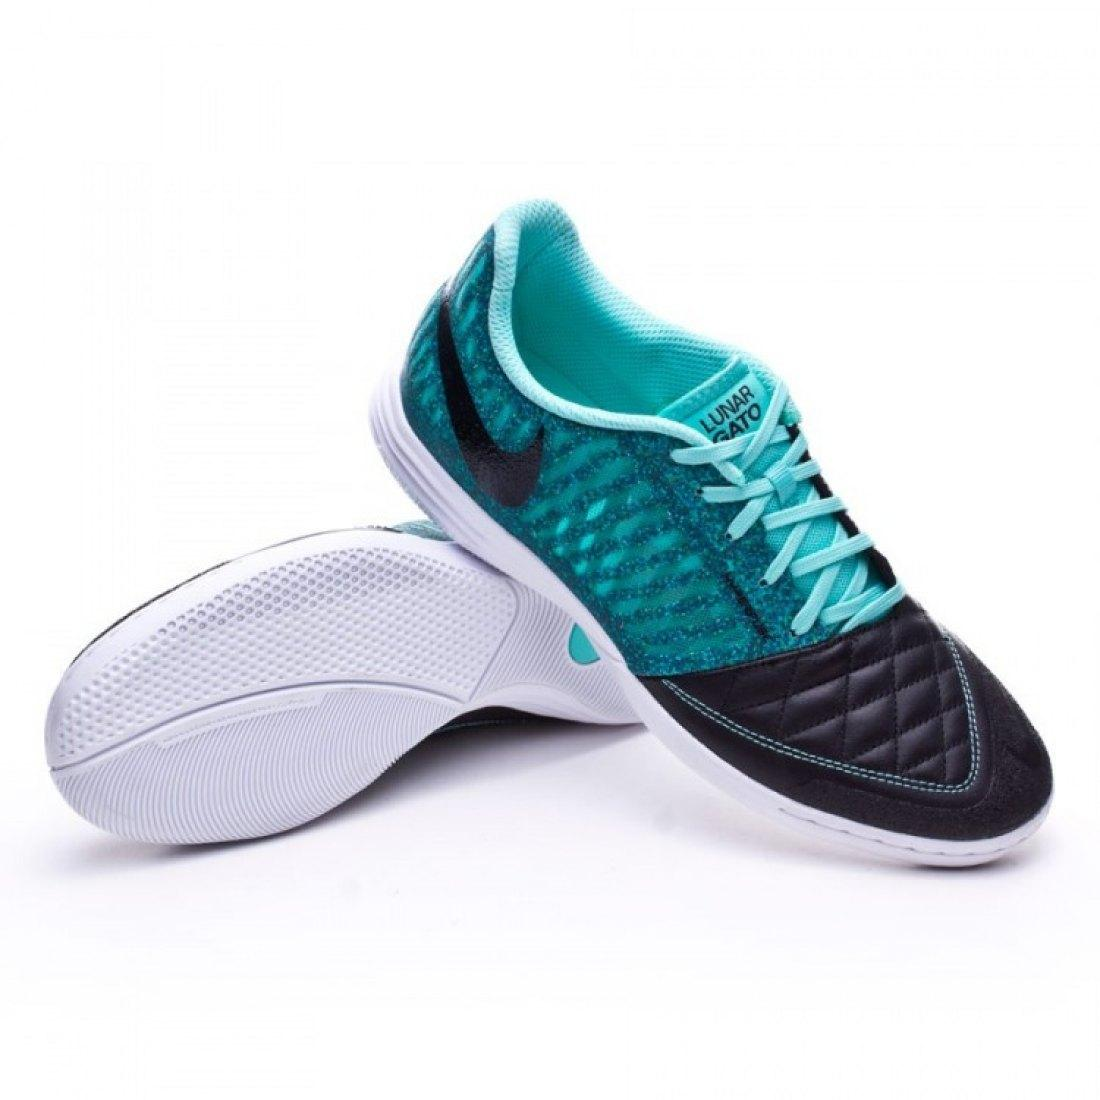 Бутсы-футзалки Nike Lunar Gato размеры 40-44 - фото 1